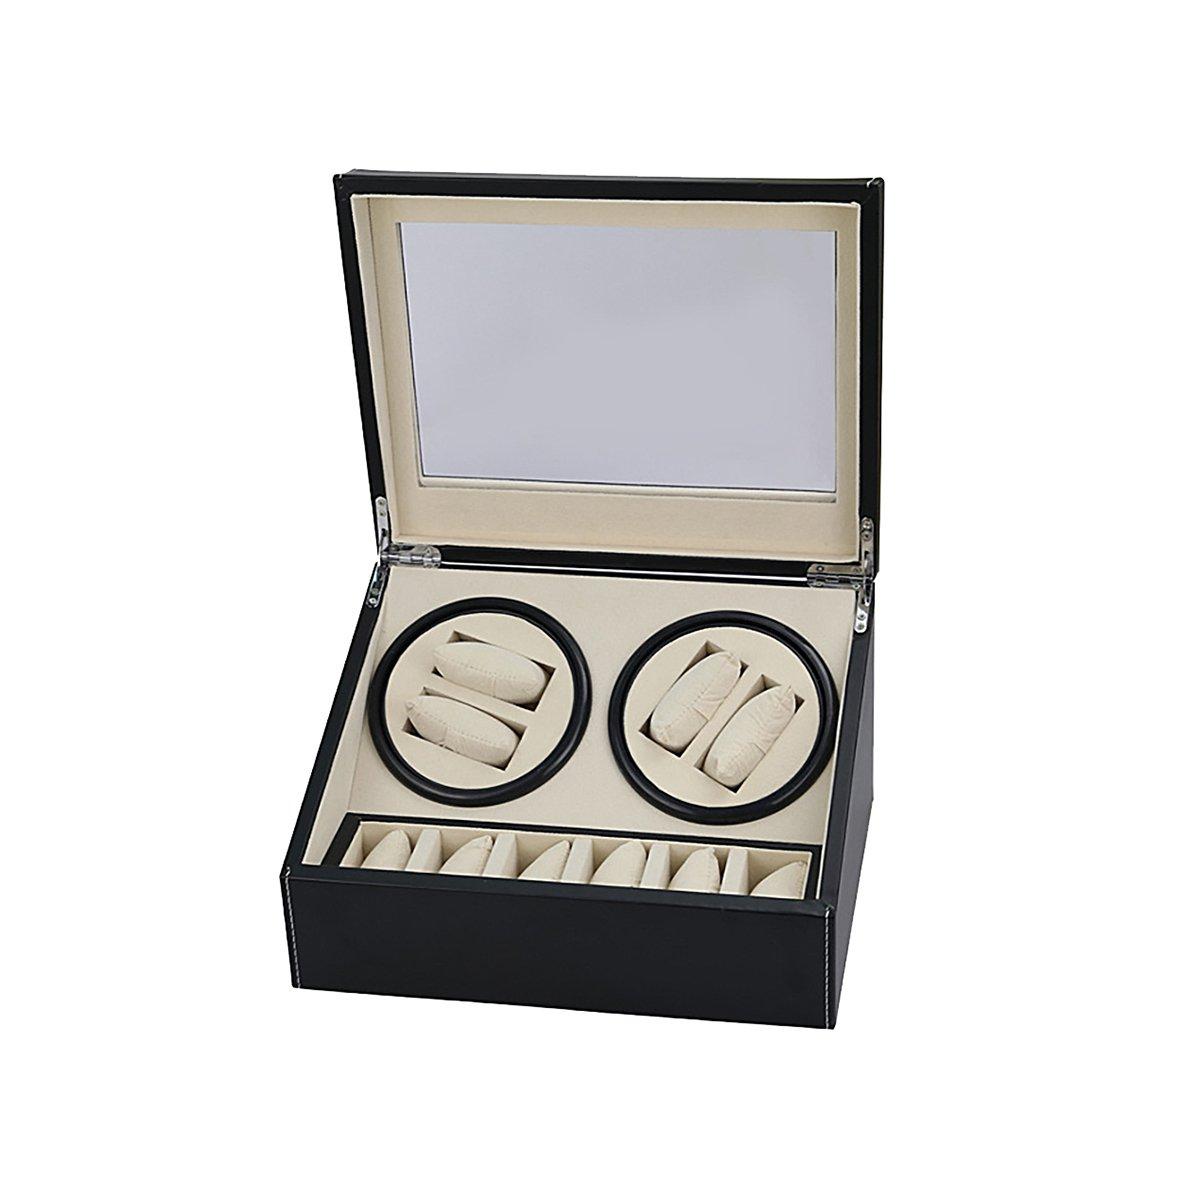 HooAMI Leather Automatic Rotation 4+6 Watch Winder Storage Case Display Box by HooAMI (Image #1)